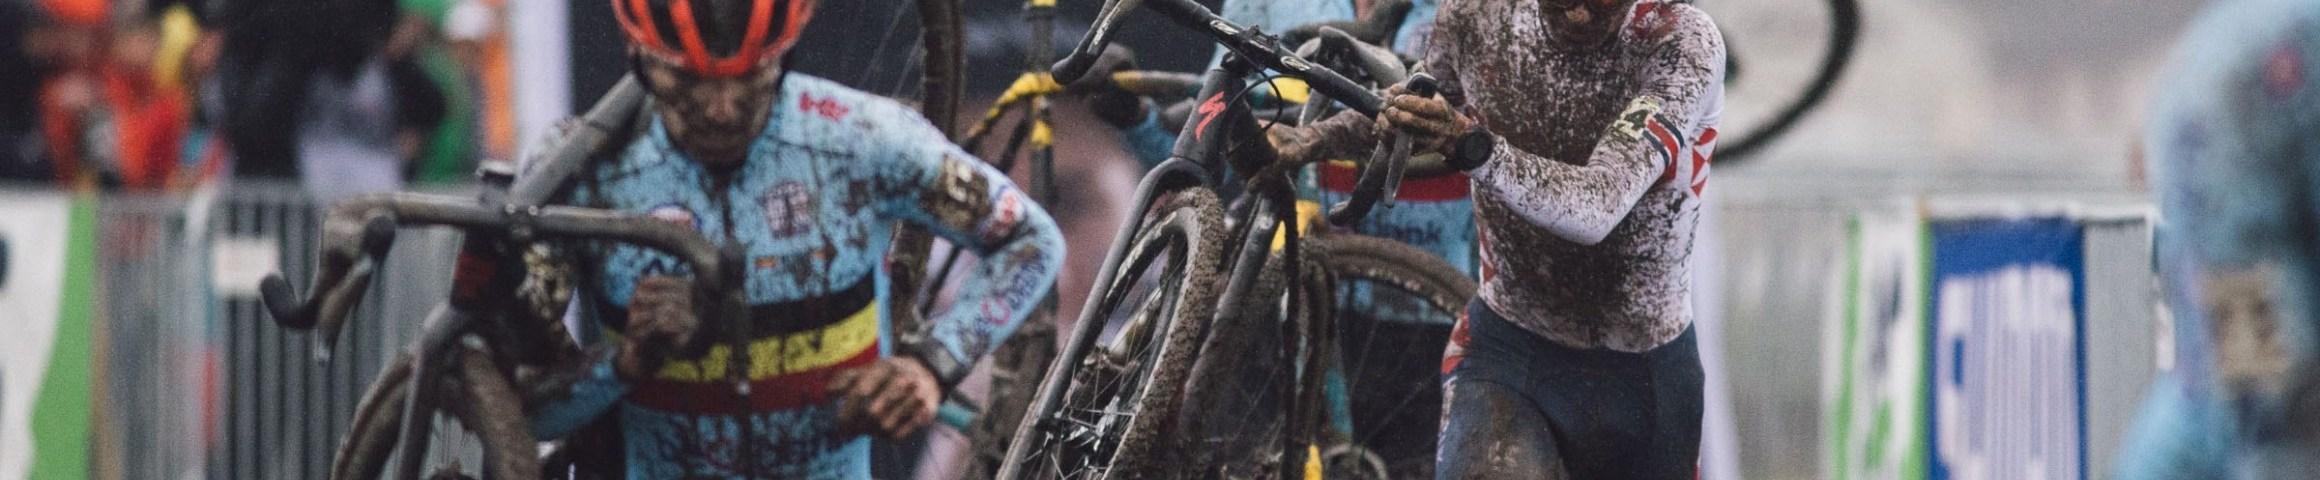 2020 Cyclocross World Championships Dubendorf